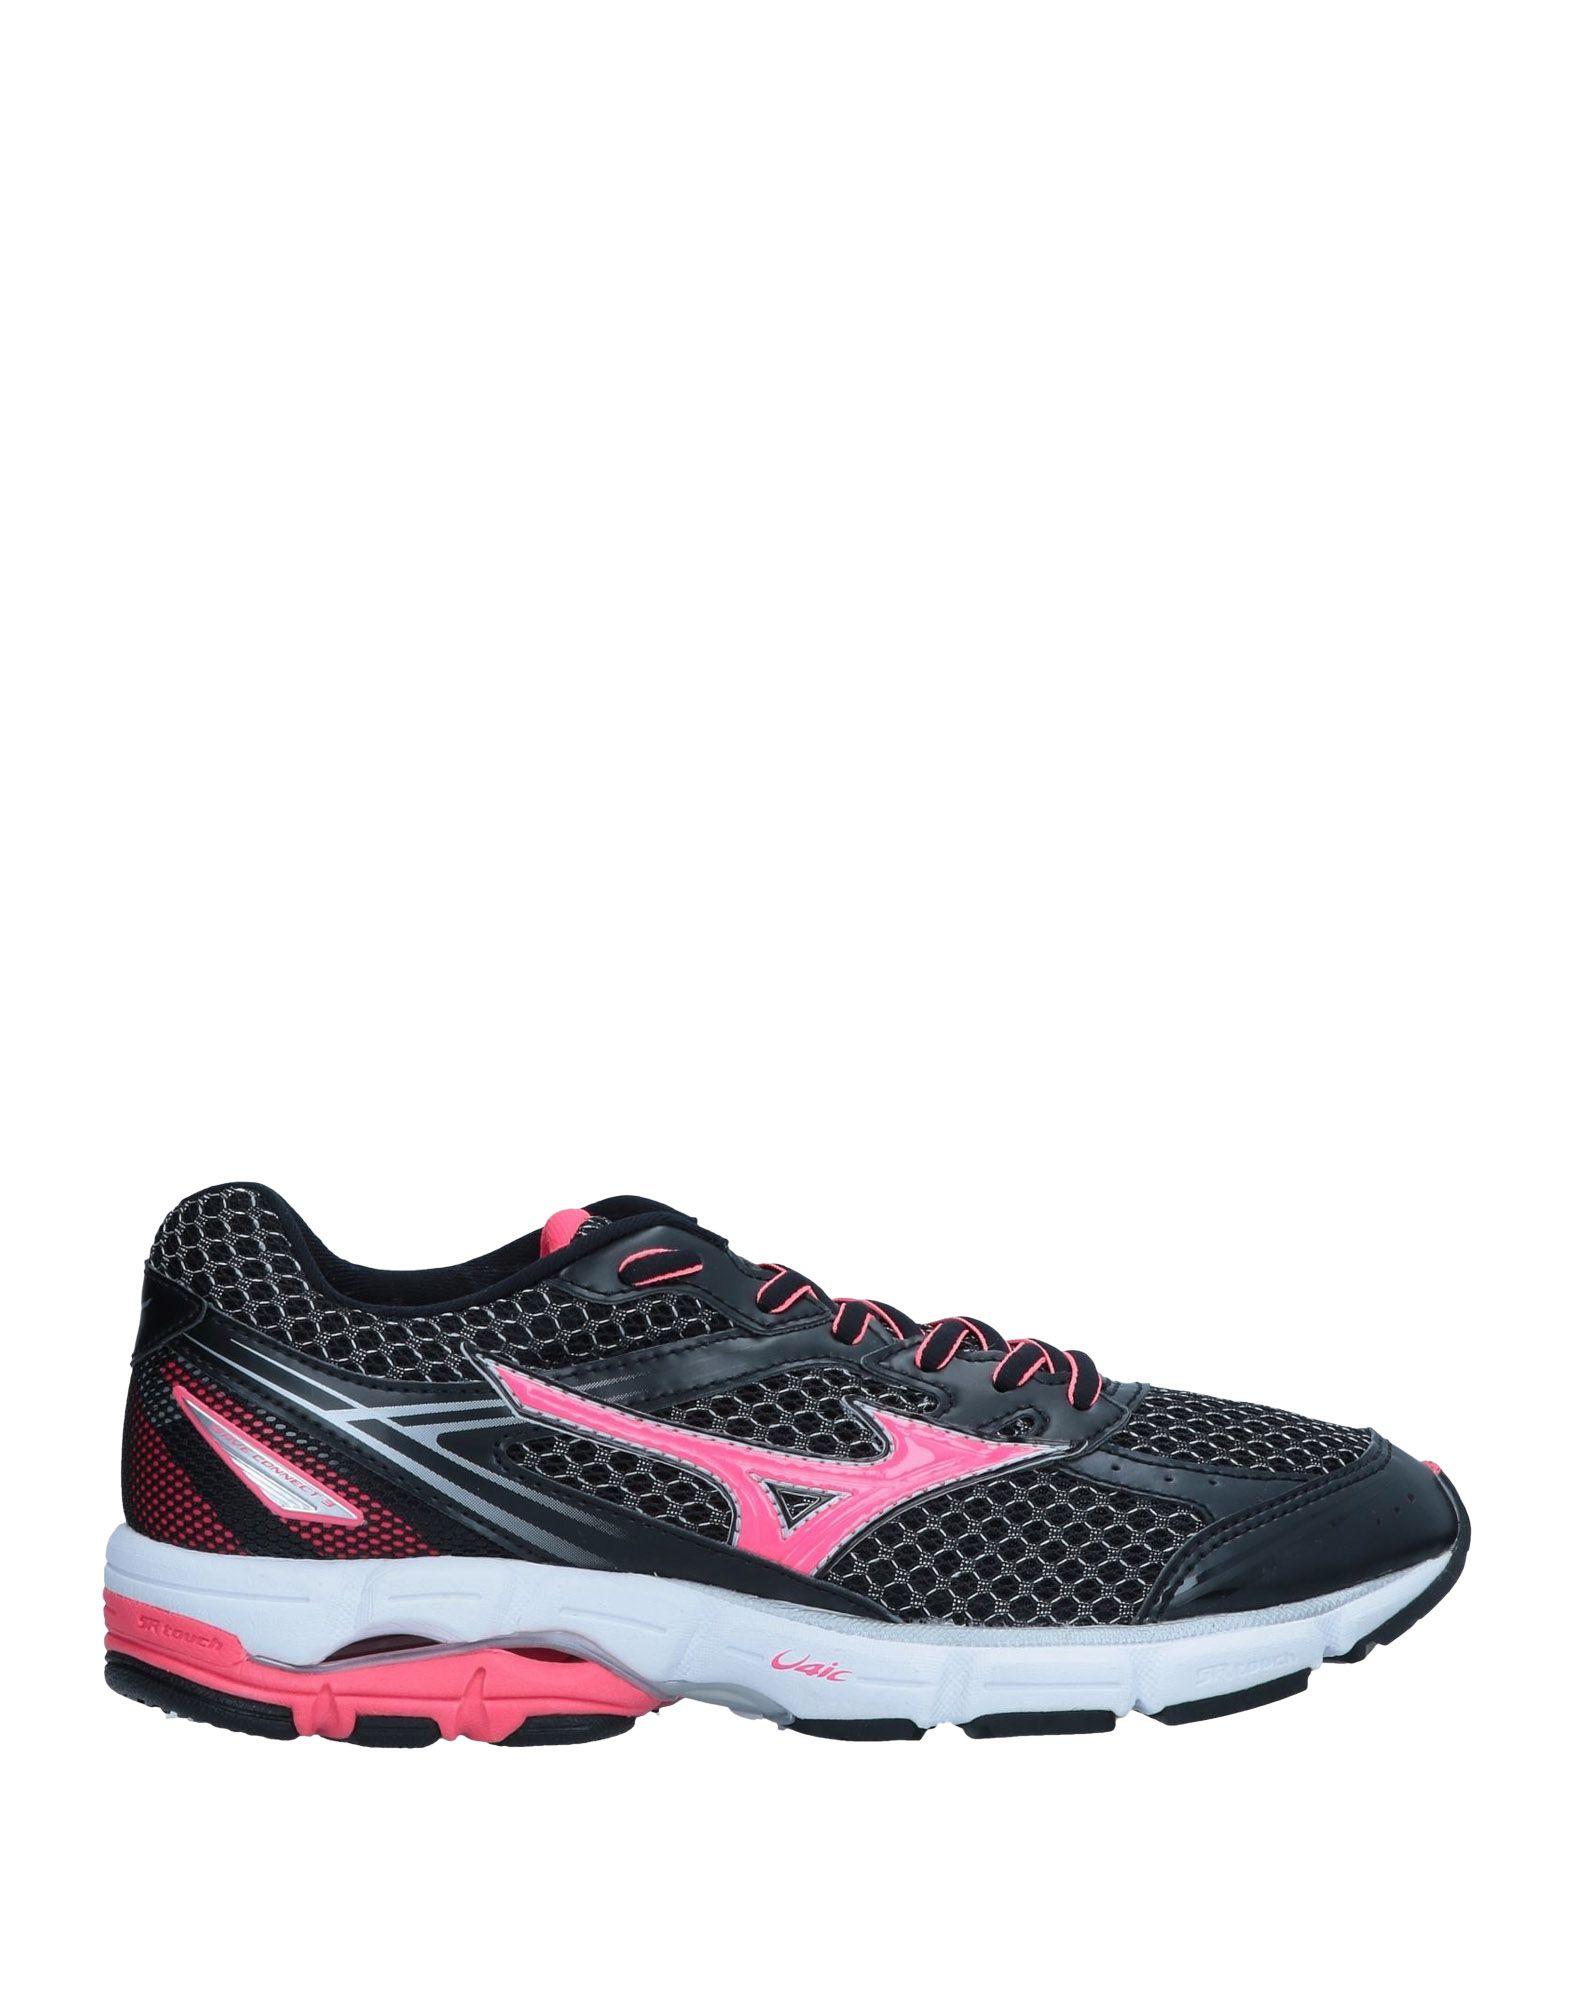 Mizuno Sneakers Damen  11546193XV Gute Qualität beliebte Schuhe